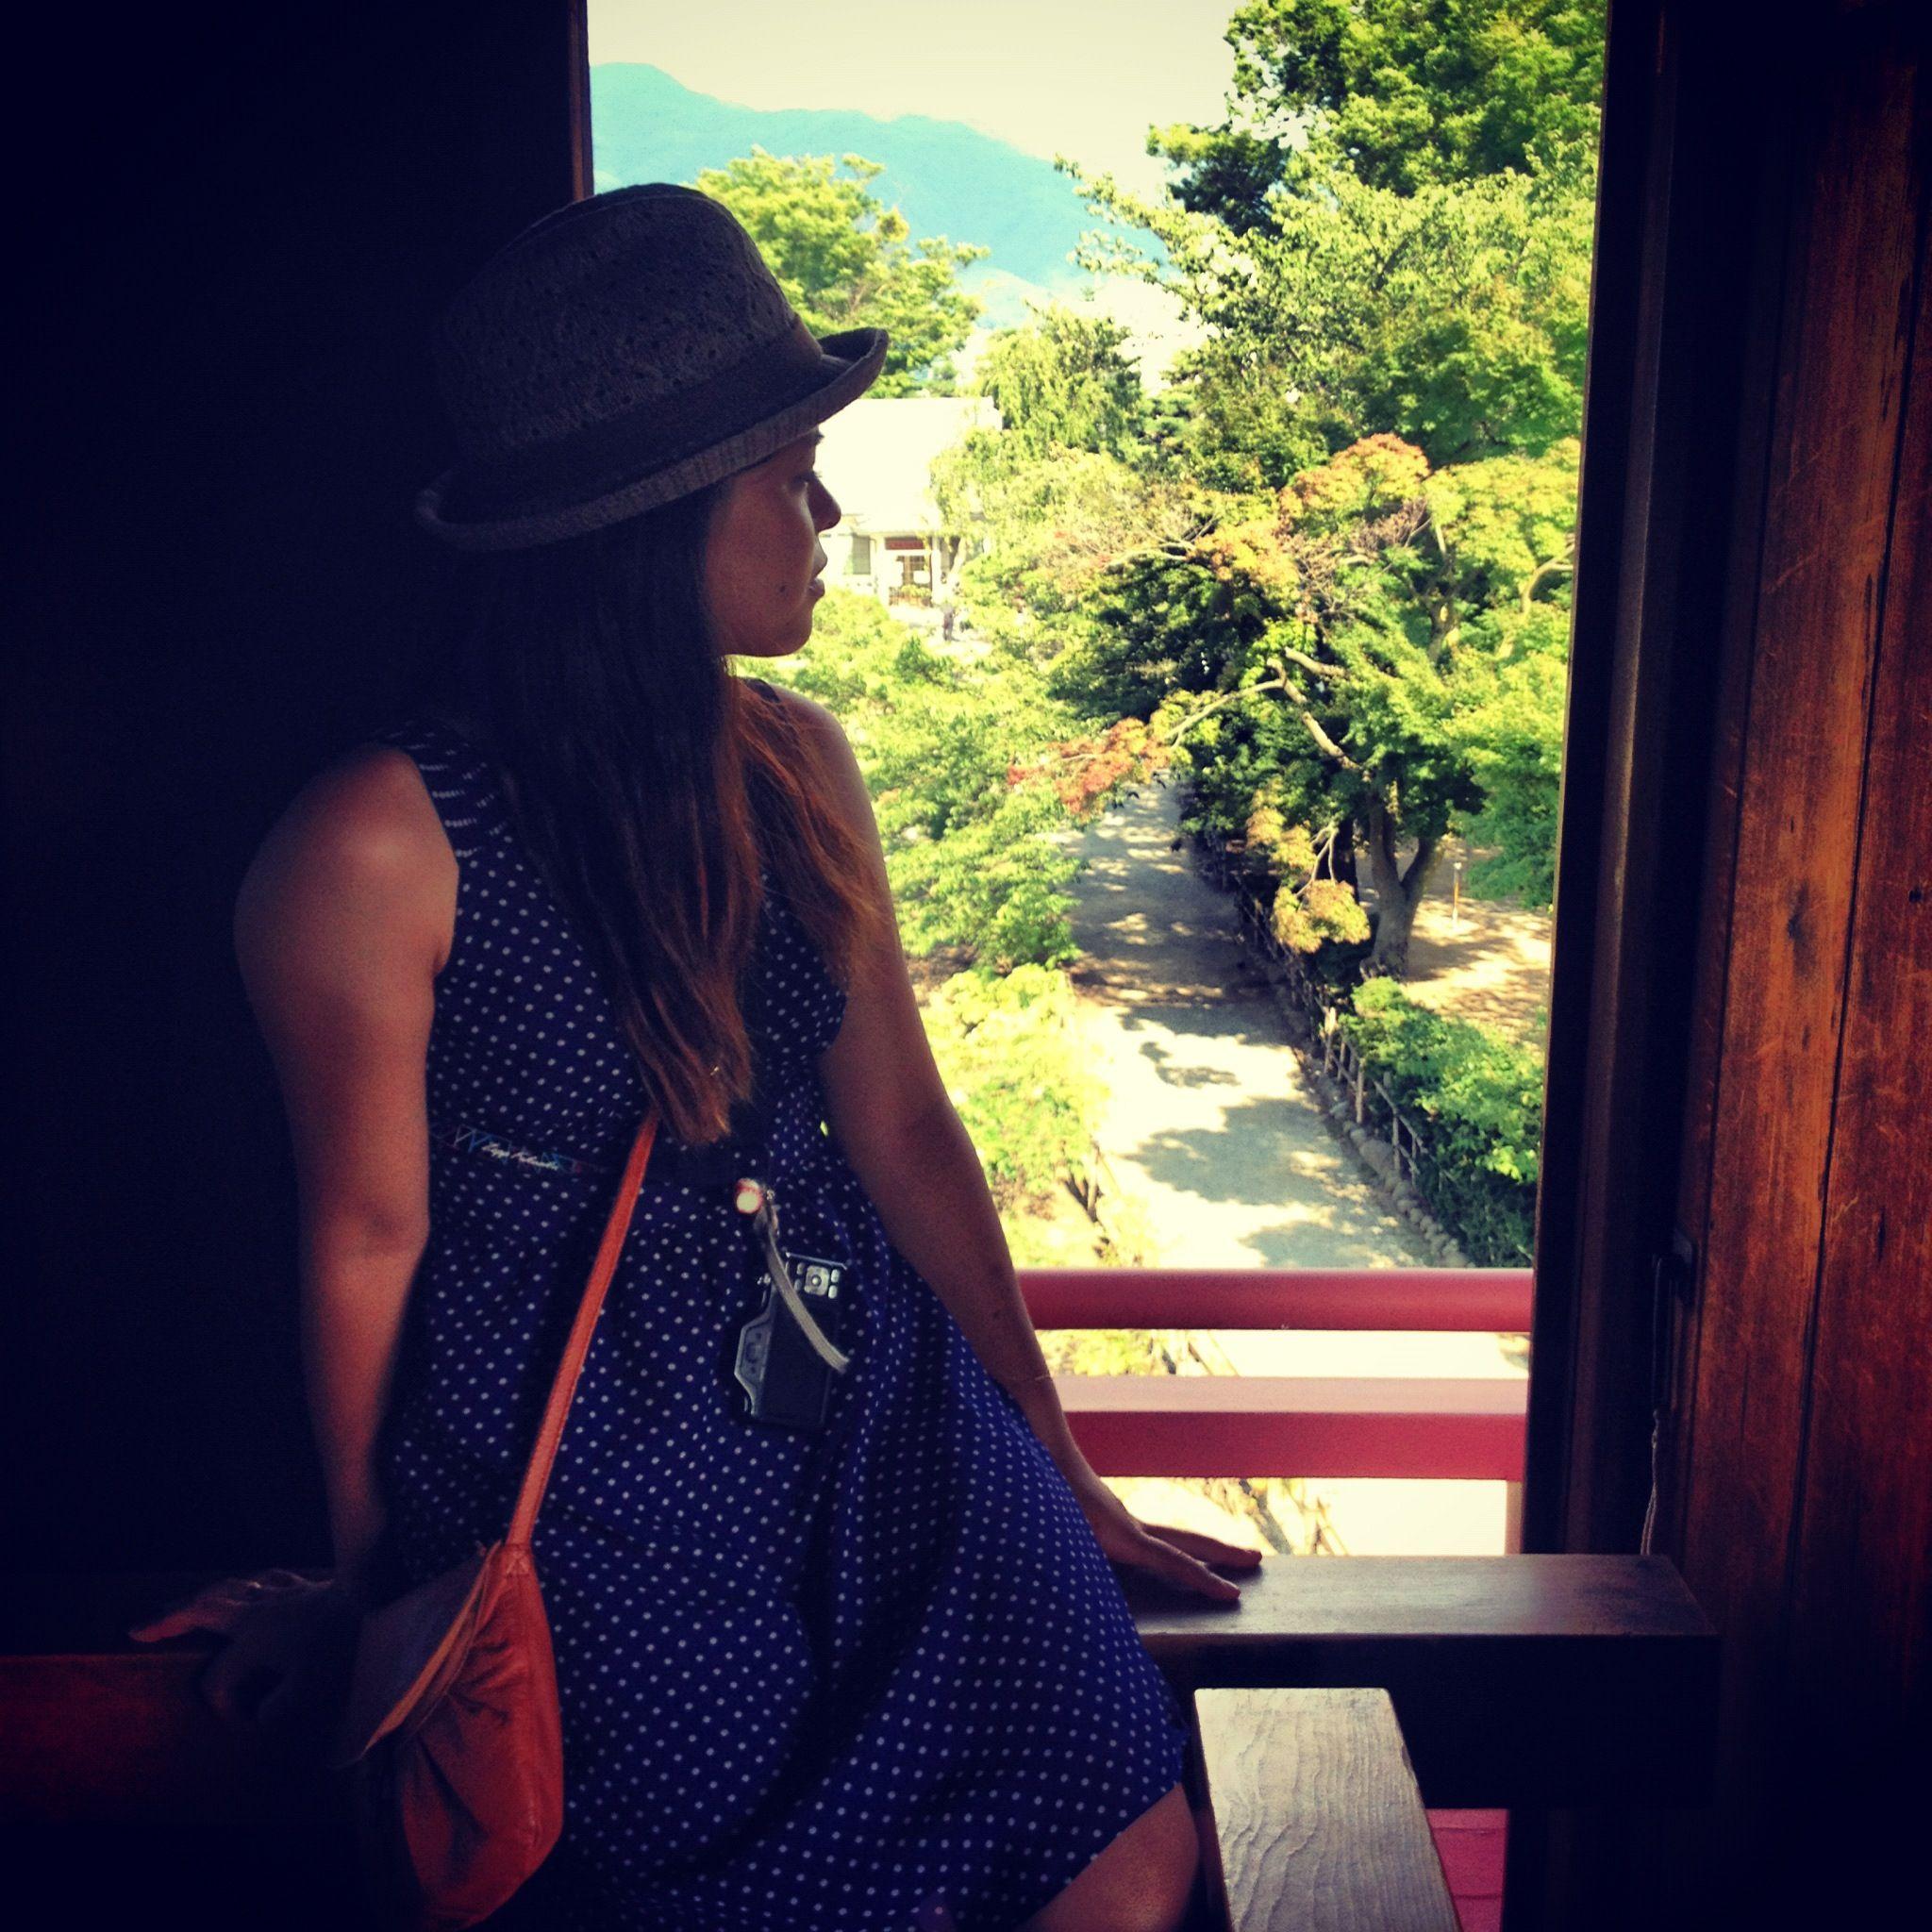 From Nagano-jyo, a Japanese castle